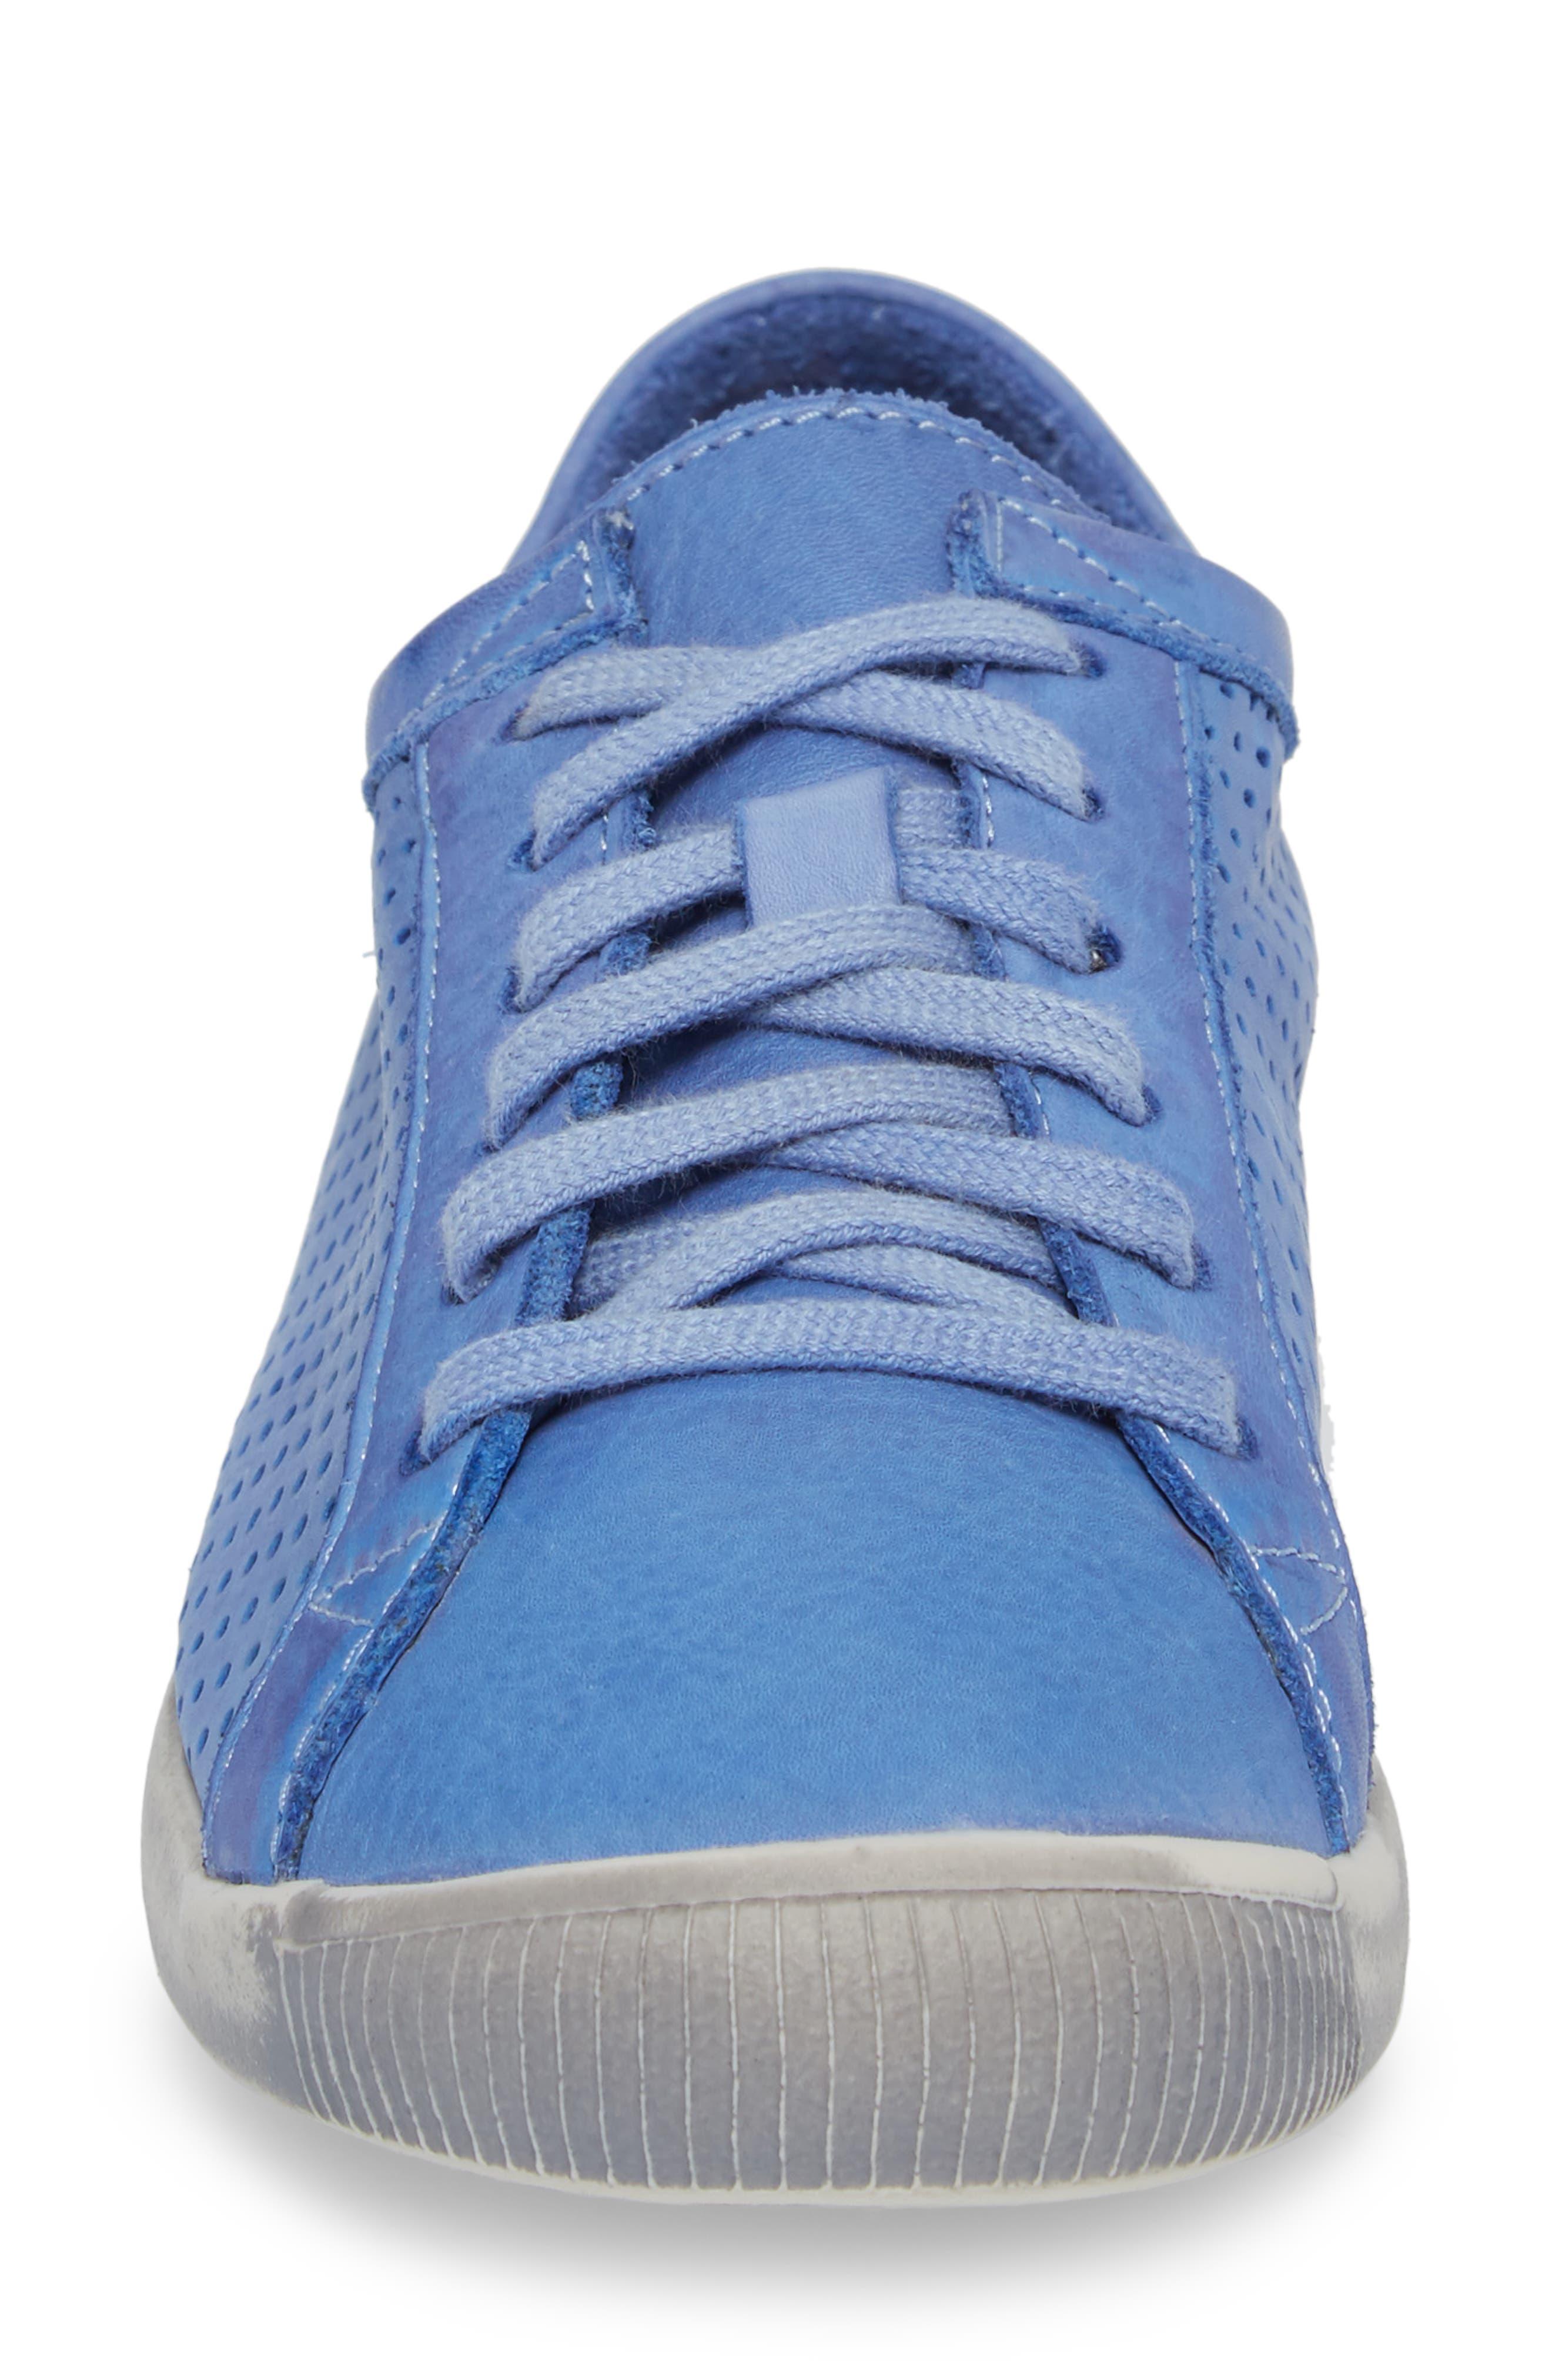 Ica Sneaker,                             Alternate thumbnail 4, color,                             Lavender Leather